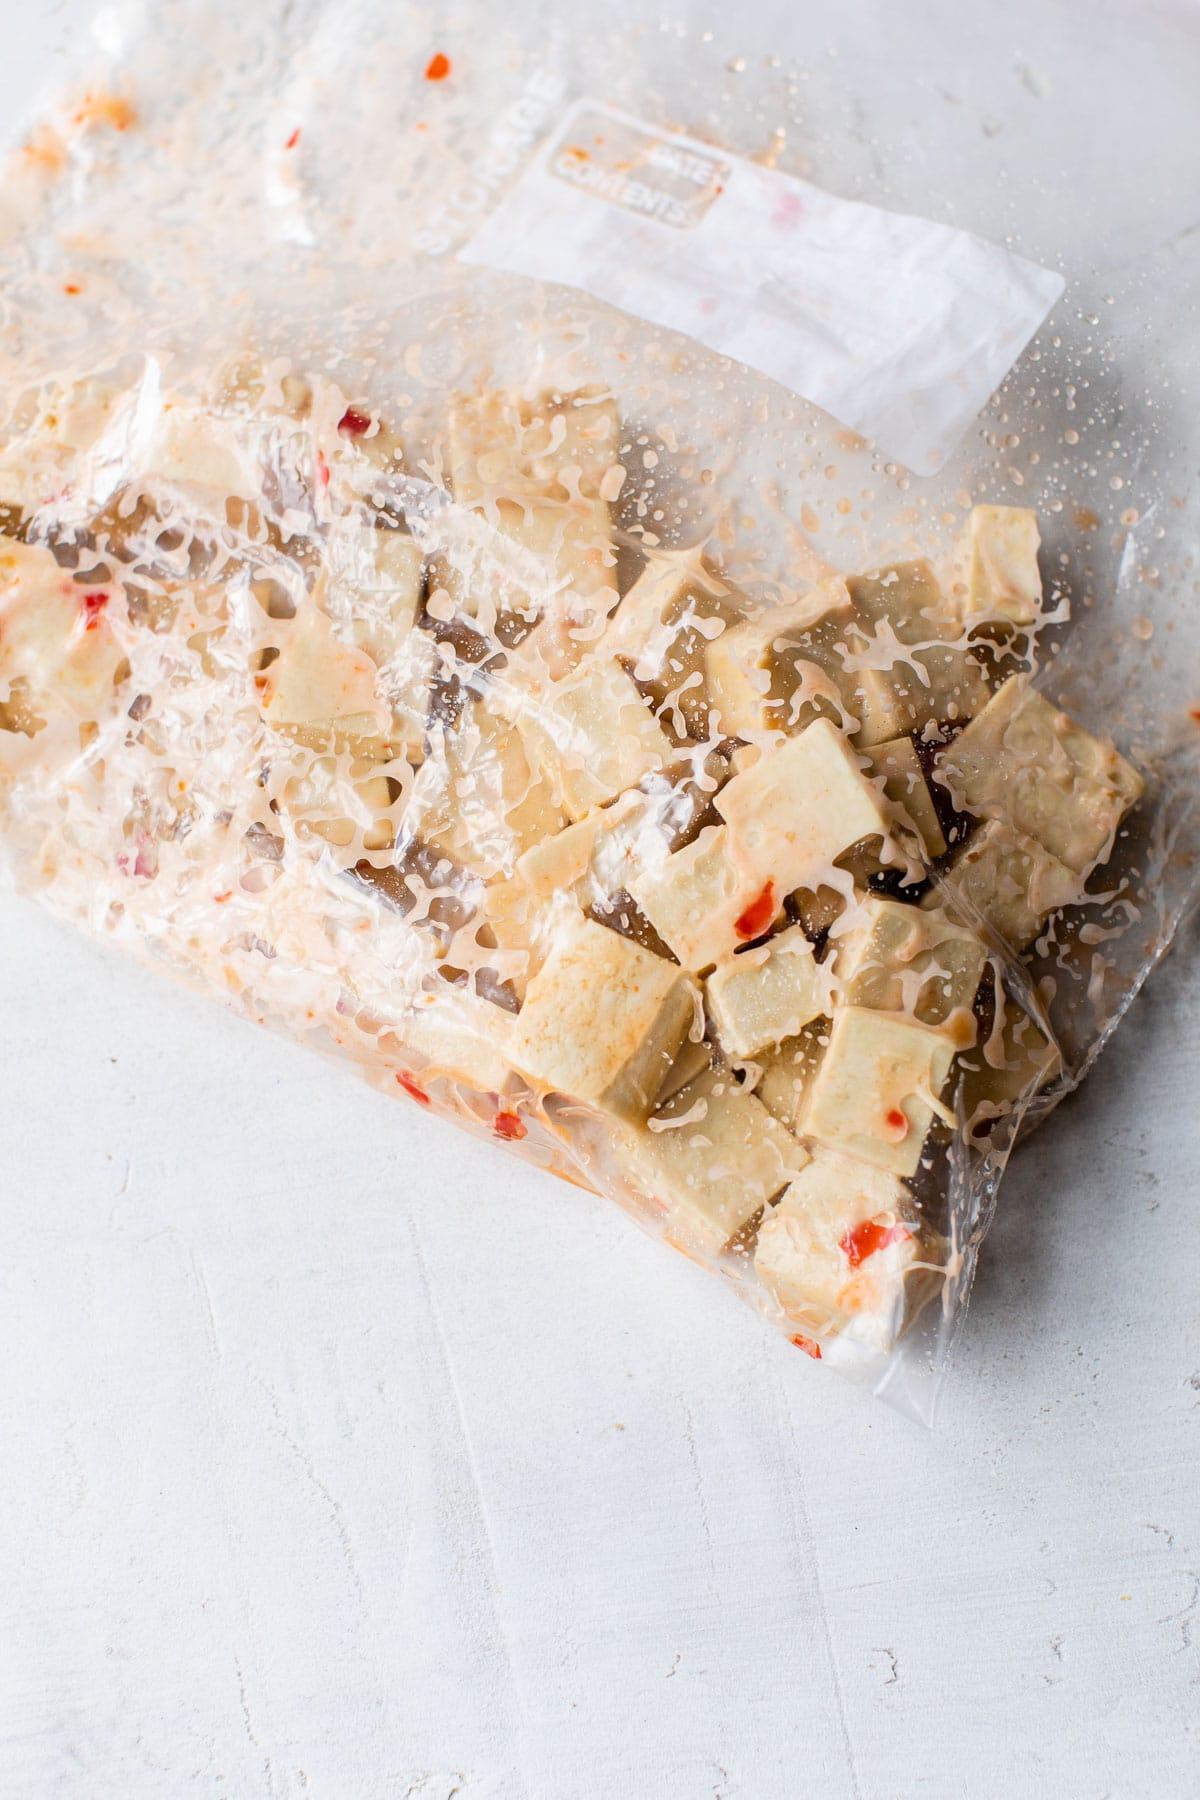 tofu marinating in a plastic bag